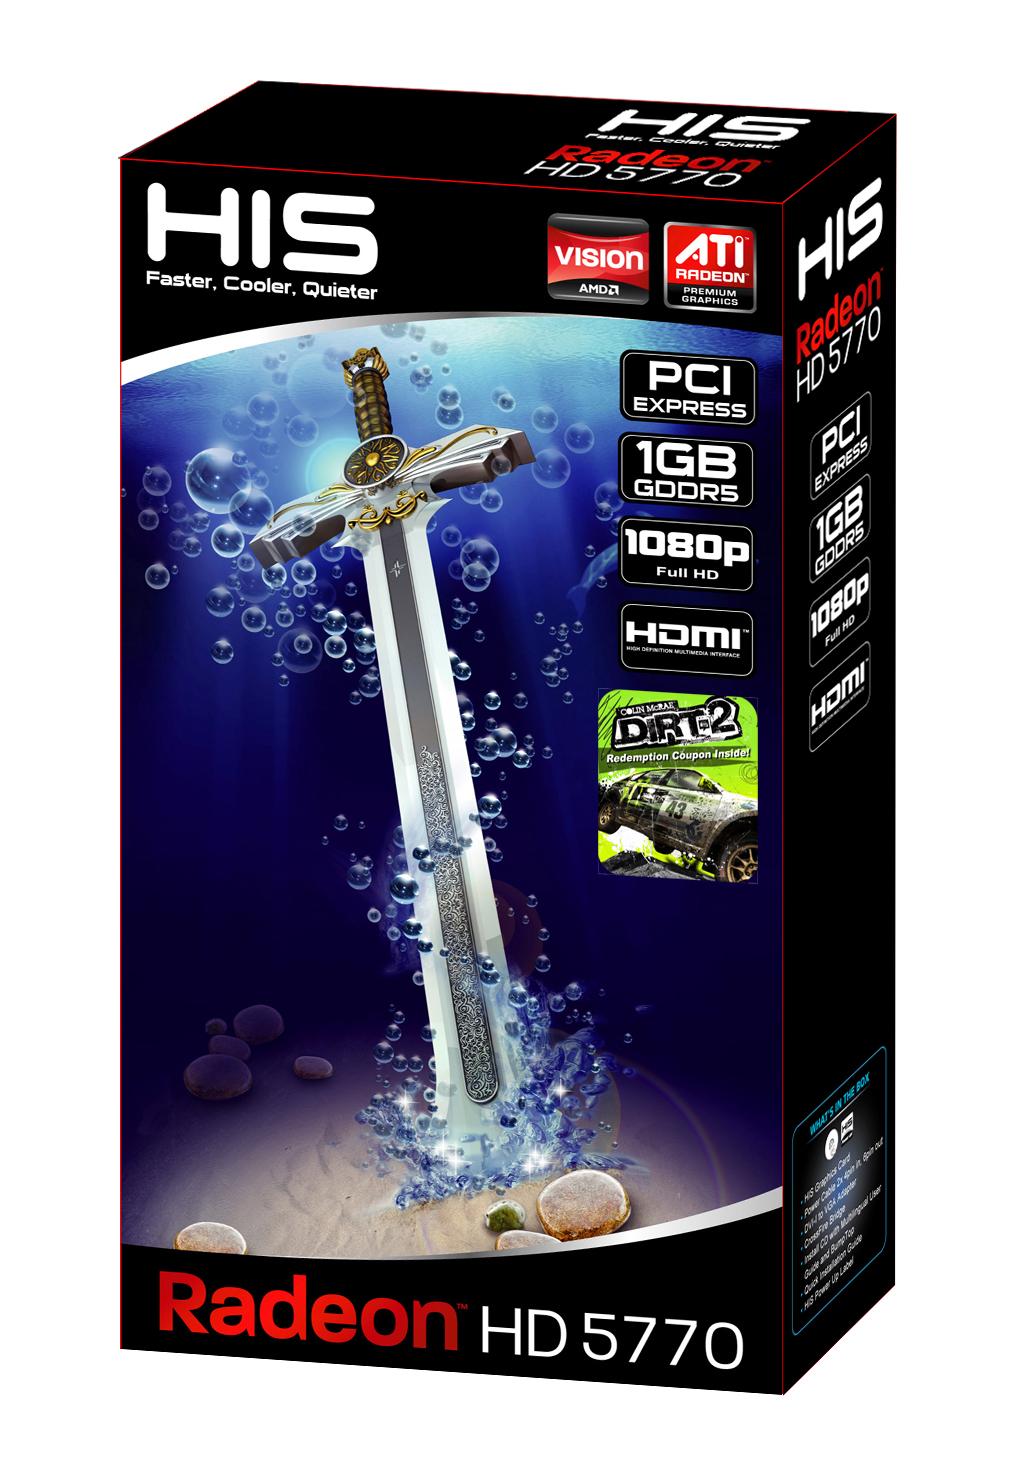 HIS HD 5770 Fan 1GB (128bit) GDDR5 PCIe (DirectX 11/ Eyefinity